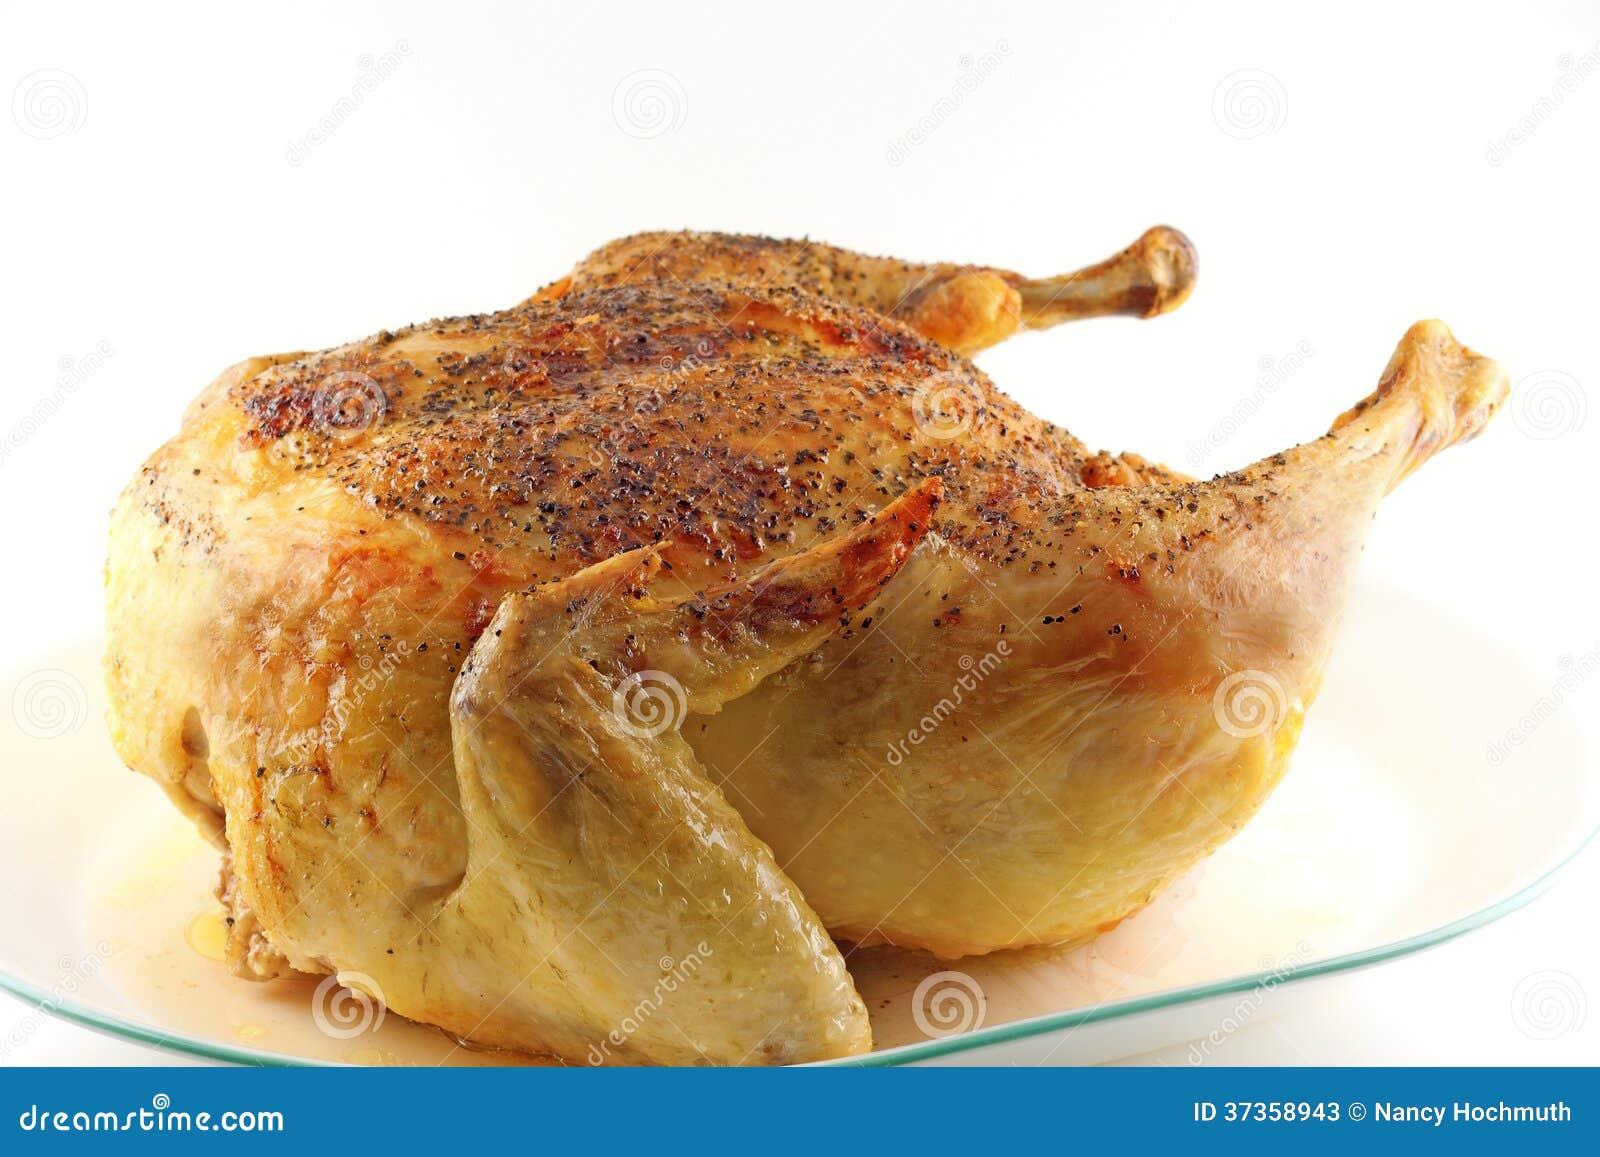 Roast Chicken Stock Photos - Image: 37358943